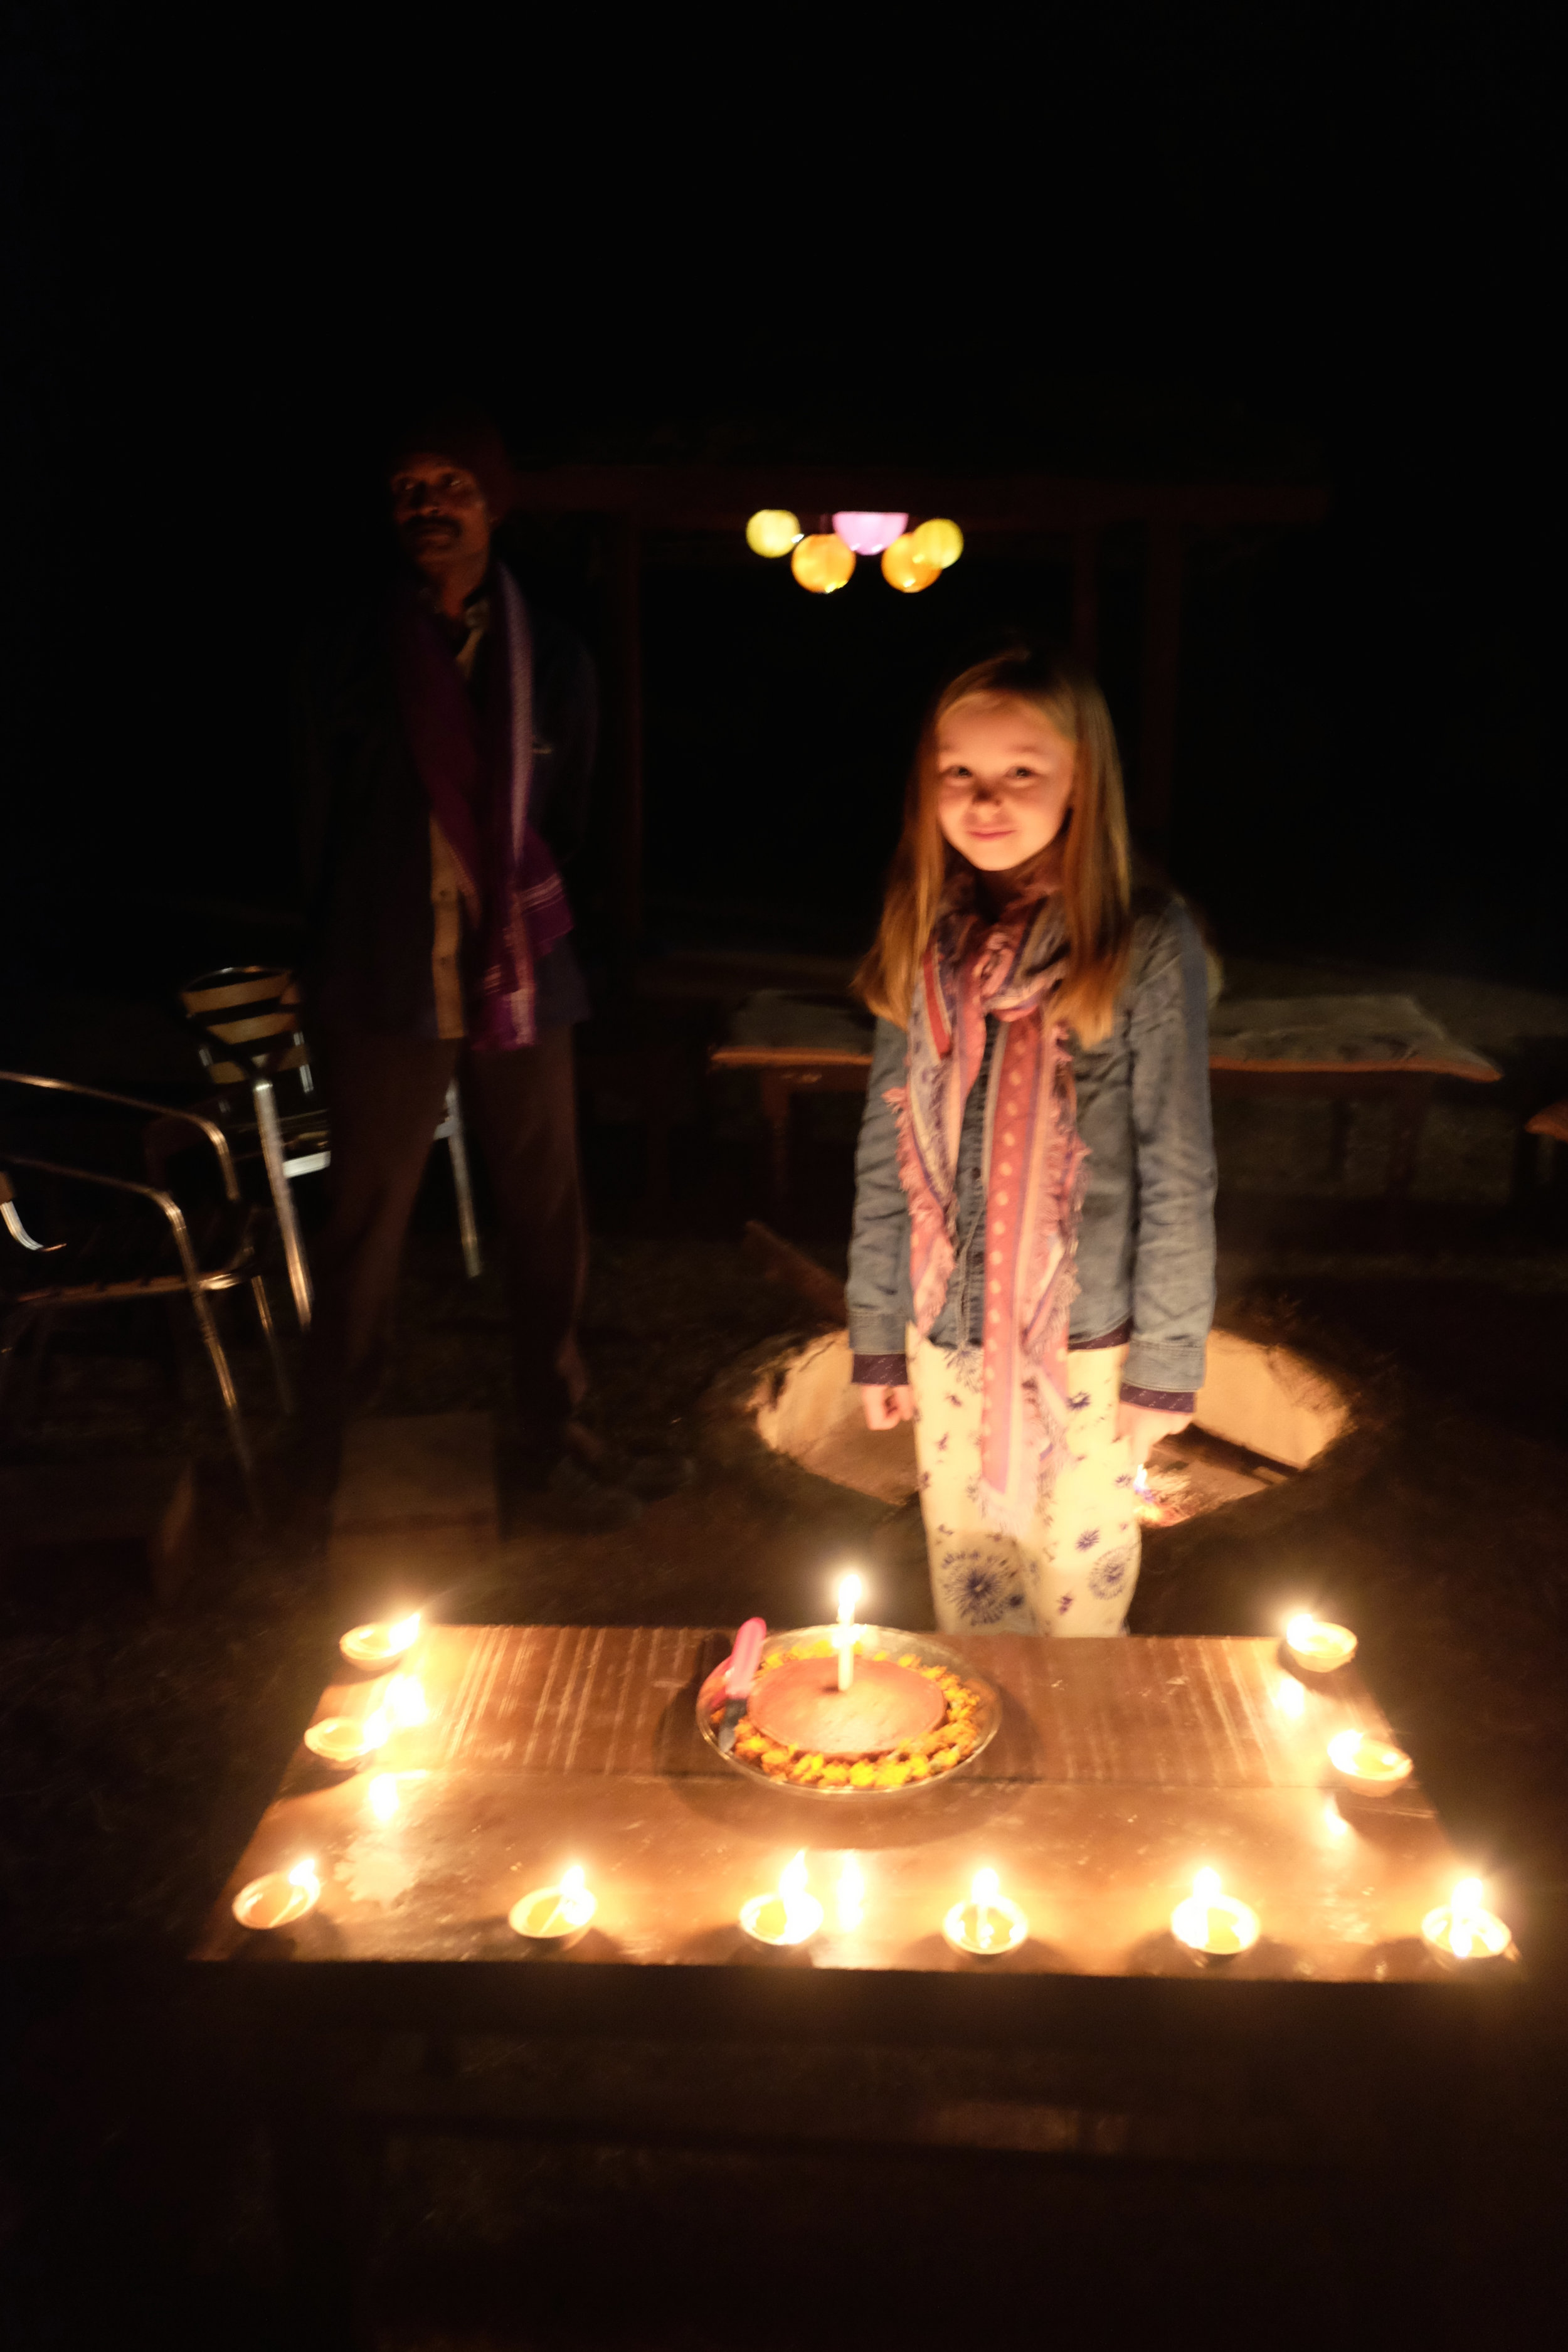 Amelia celebrates her 9th birthday in India!